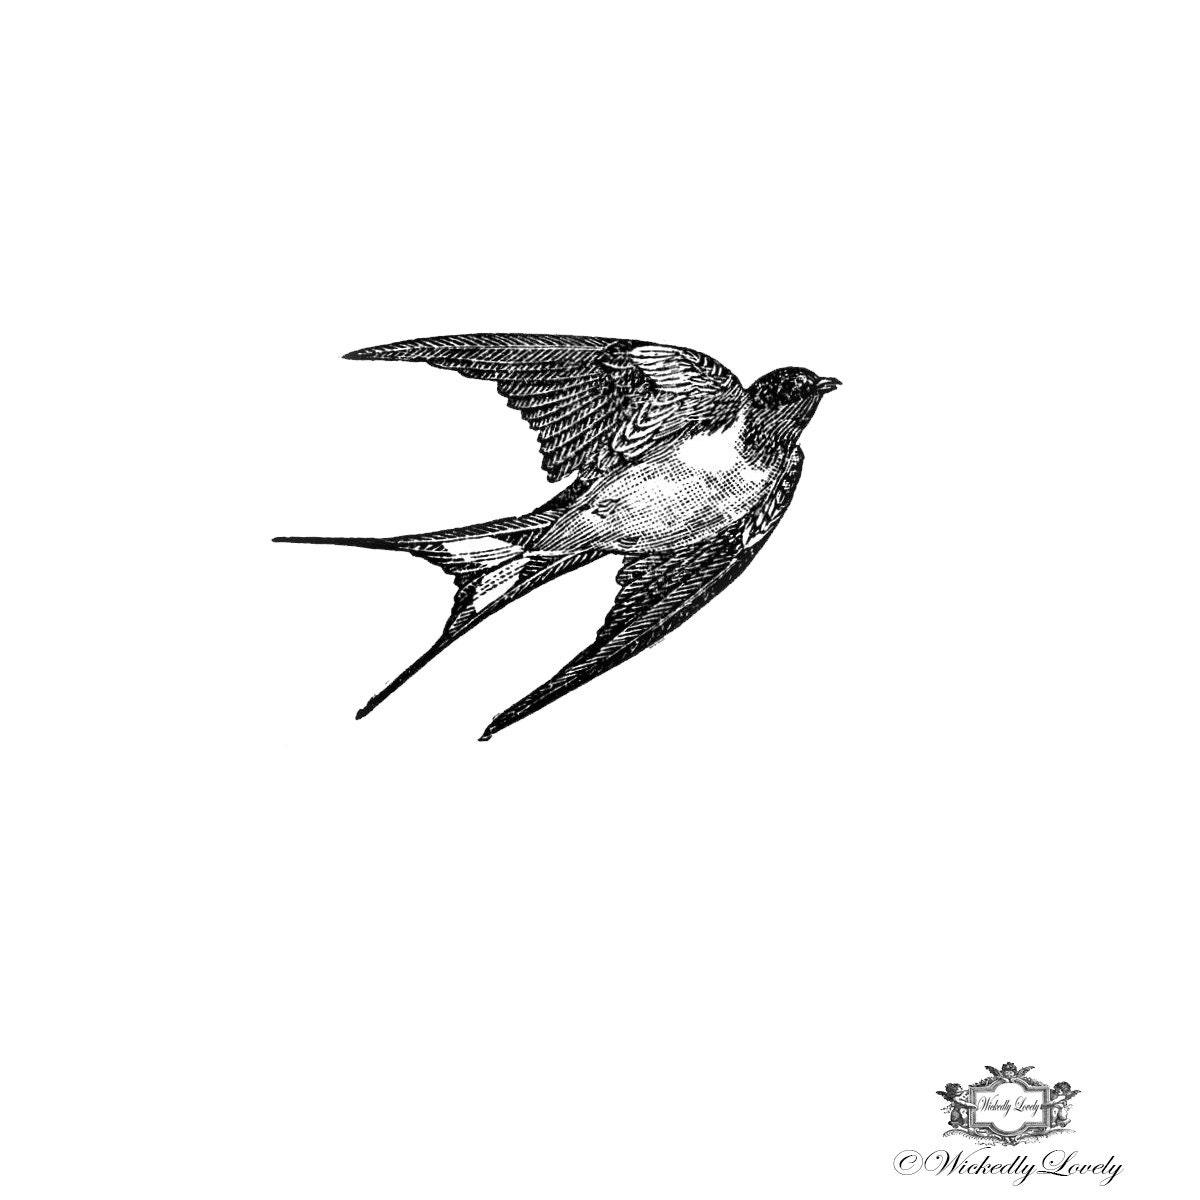 Tattoo Art Black And White: Black And White Vintage Swallow Swallow Tattoo Bird Tattoo